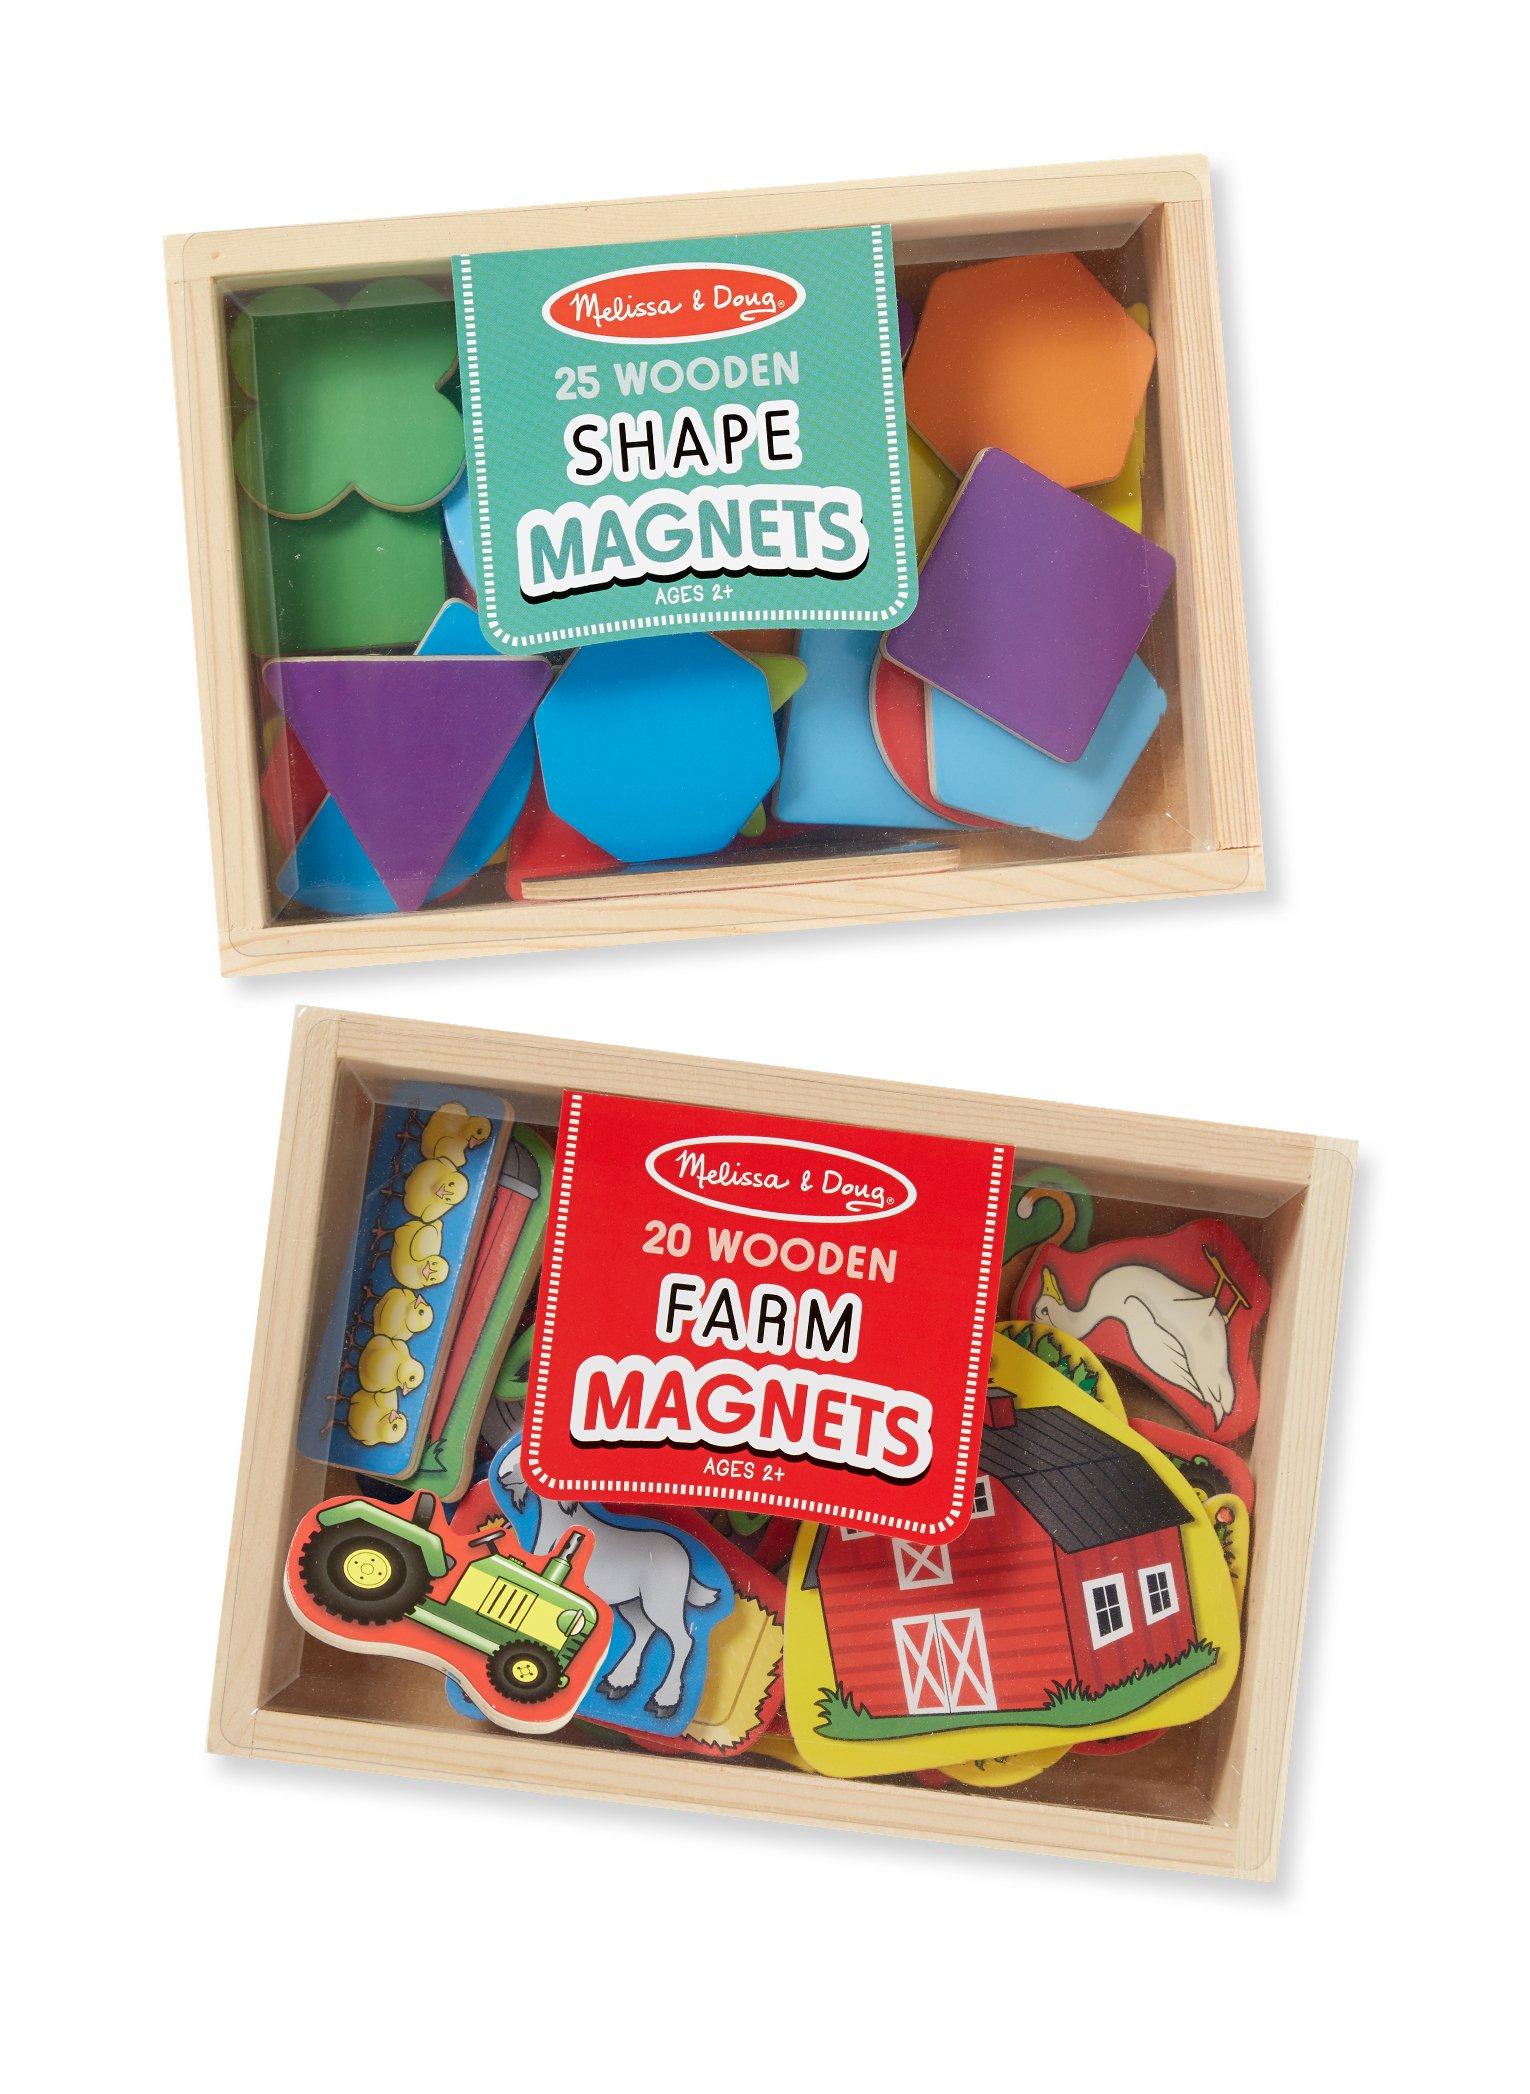 Melissa & Doug Wooden Magnets Set - Shapes and Farm (45 pcs)